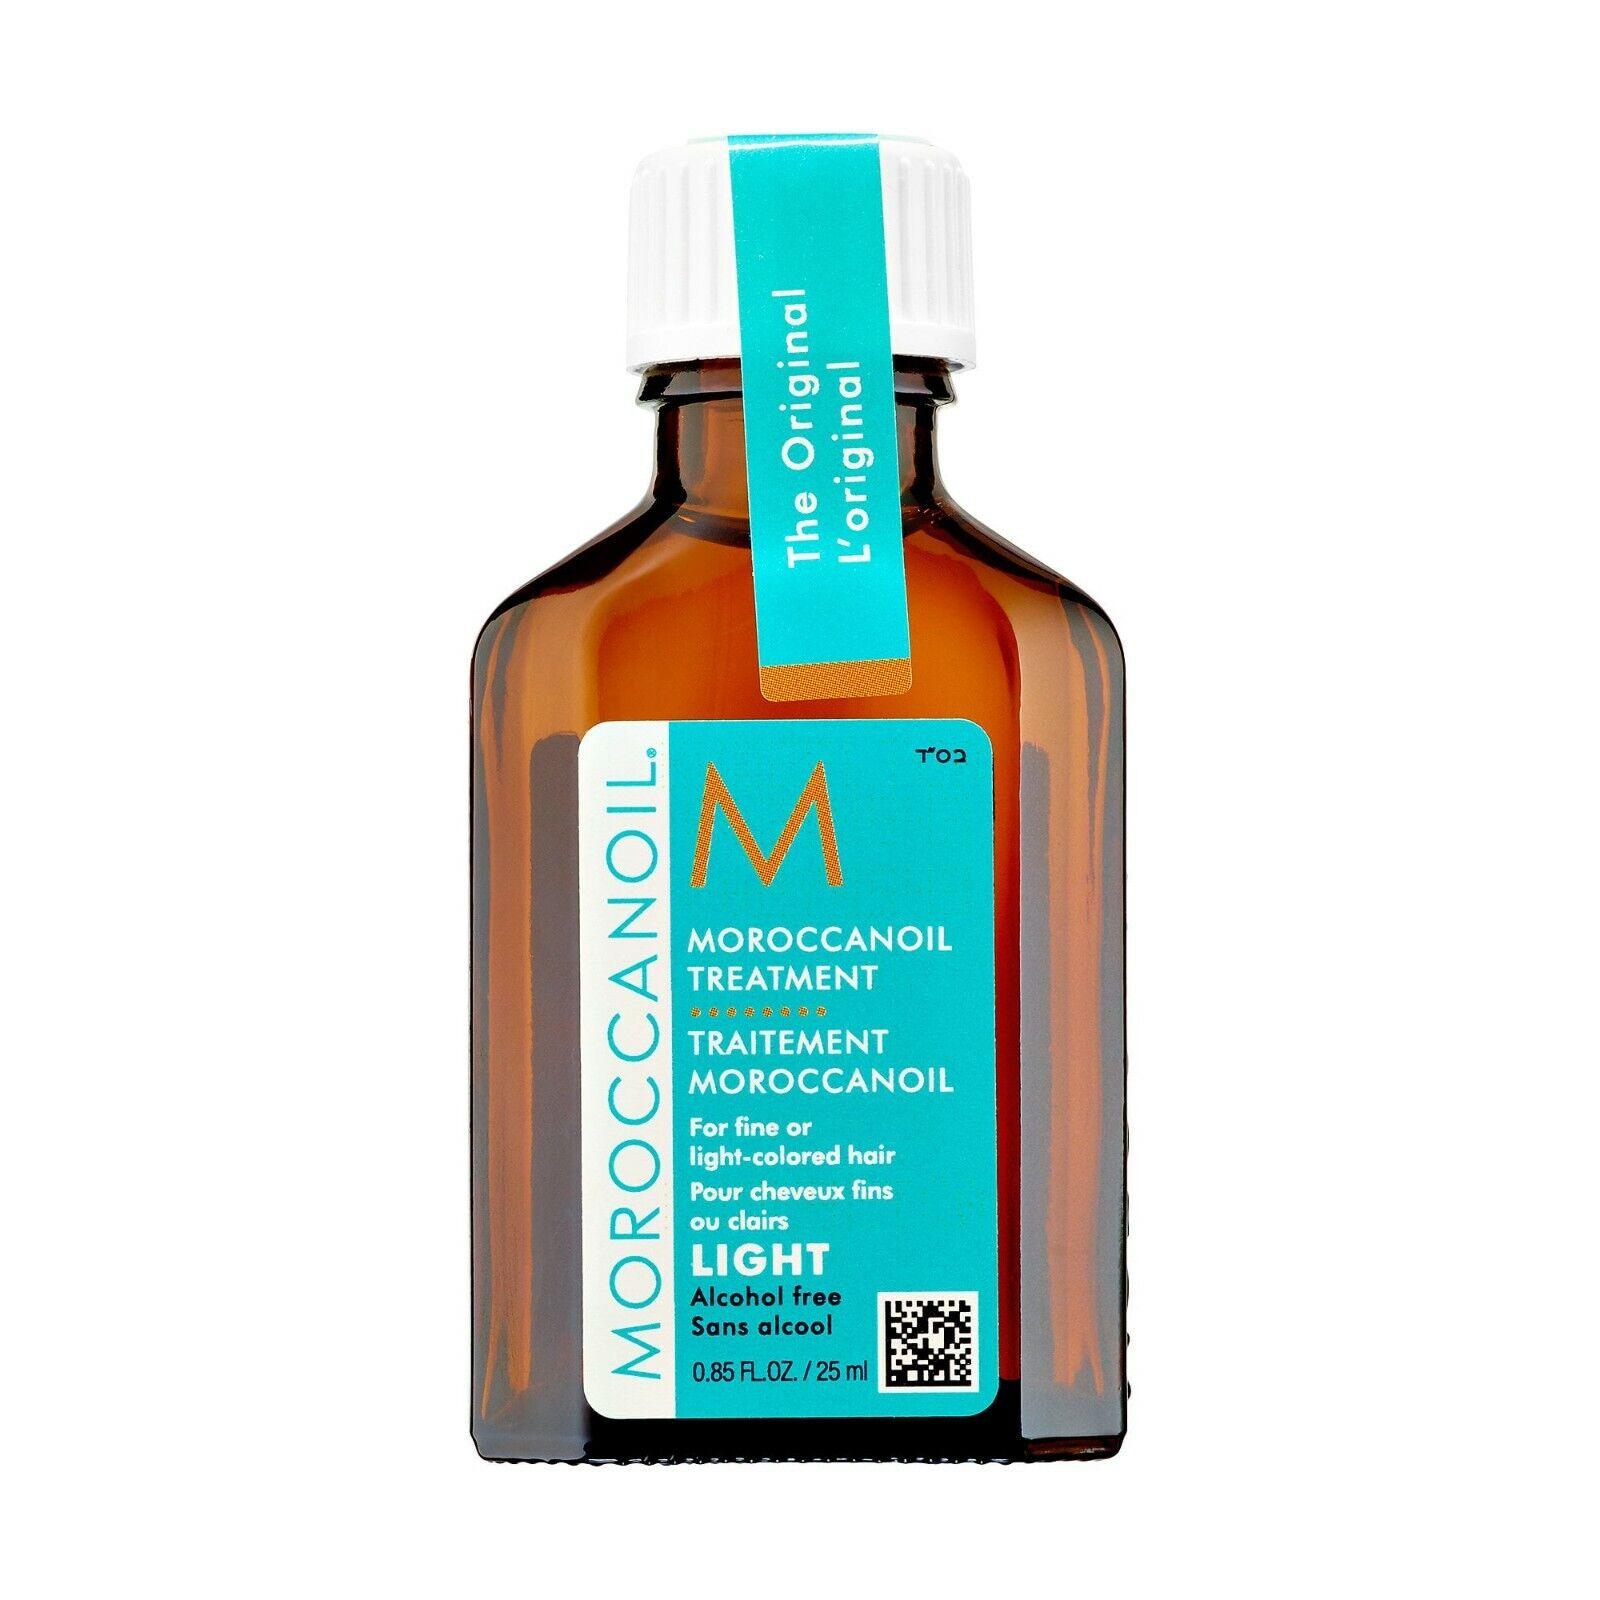 MoroccanOil Light Oil Treatment .85 oz